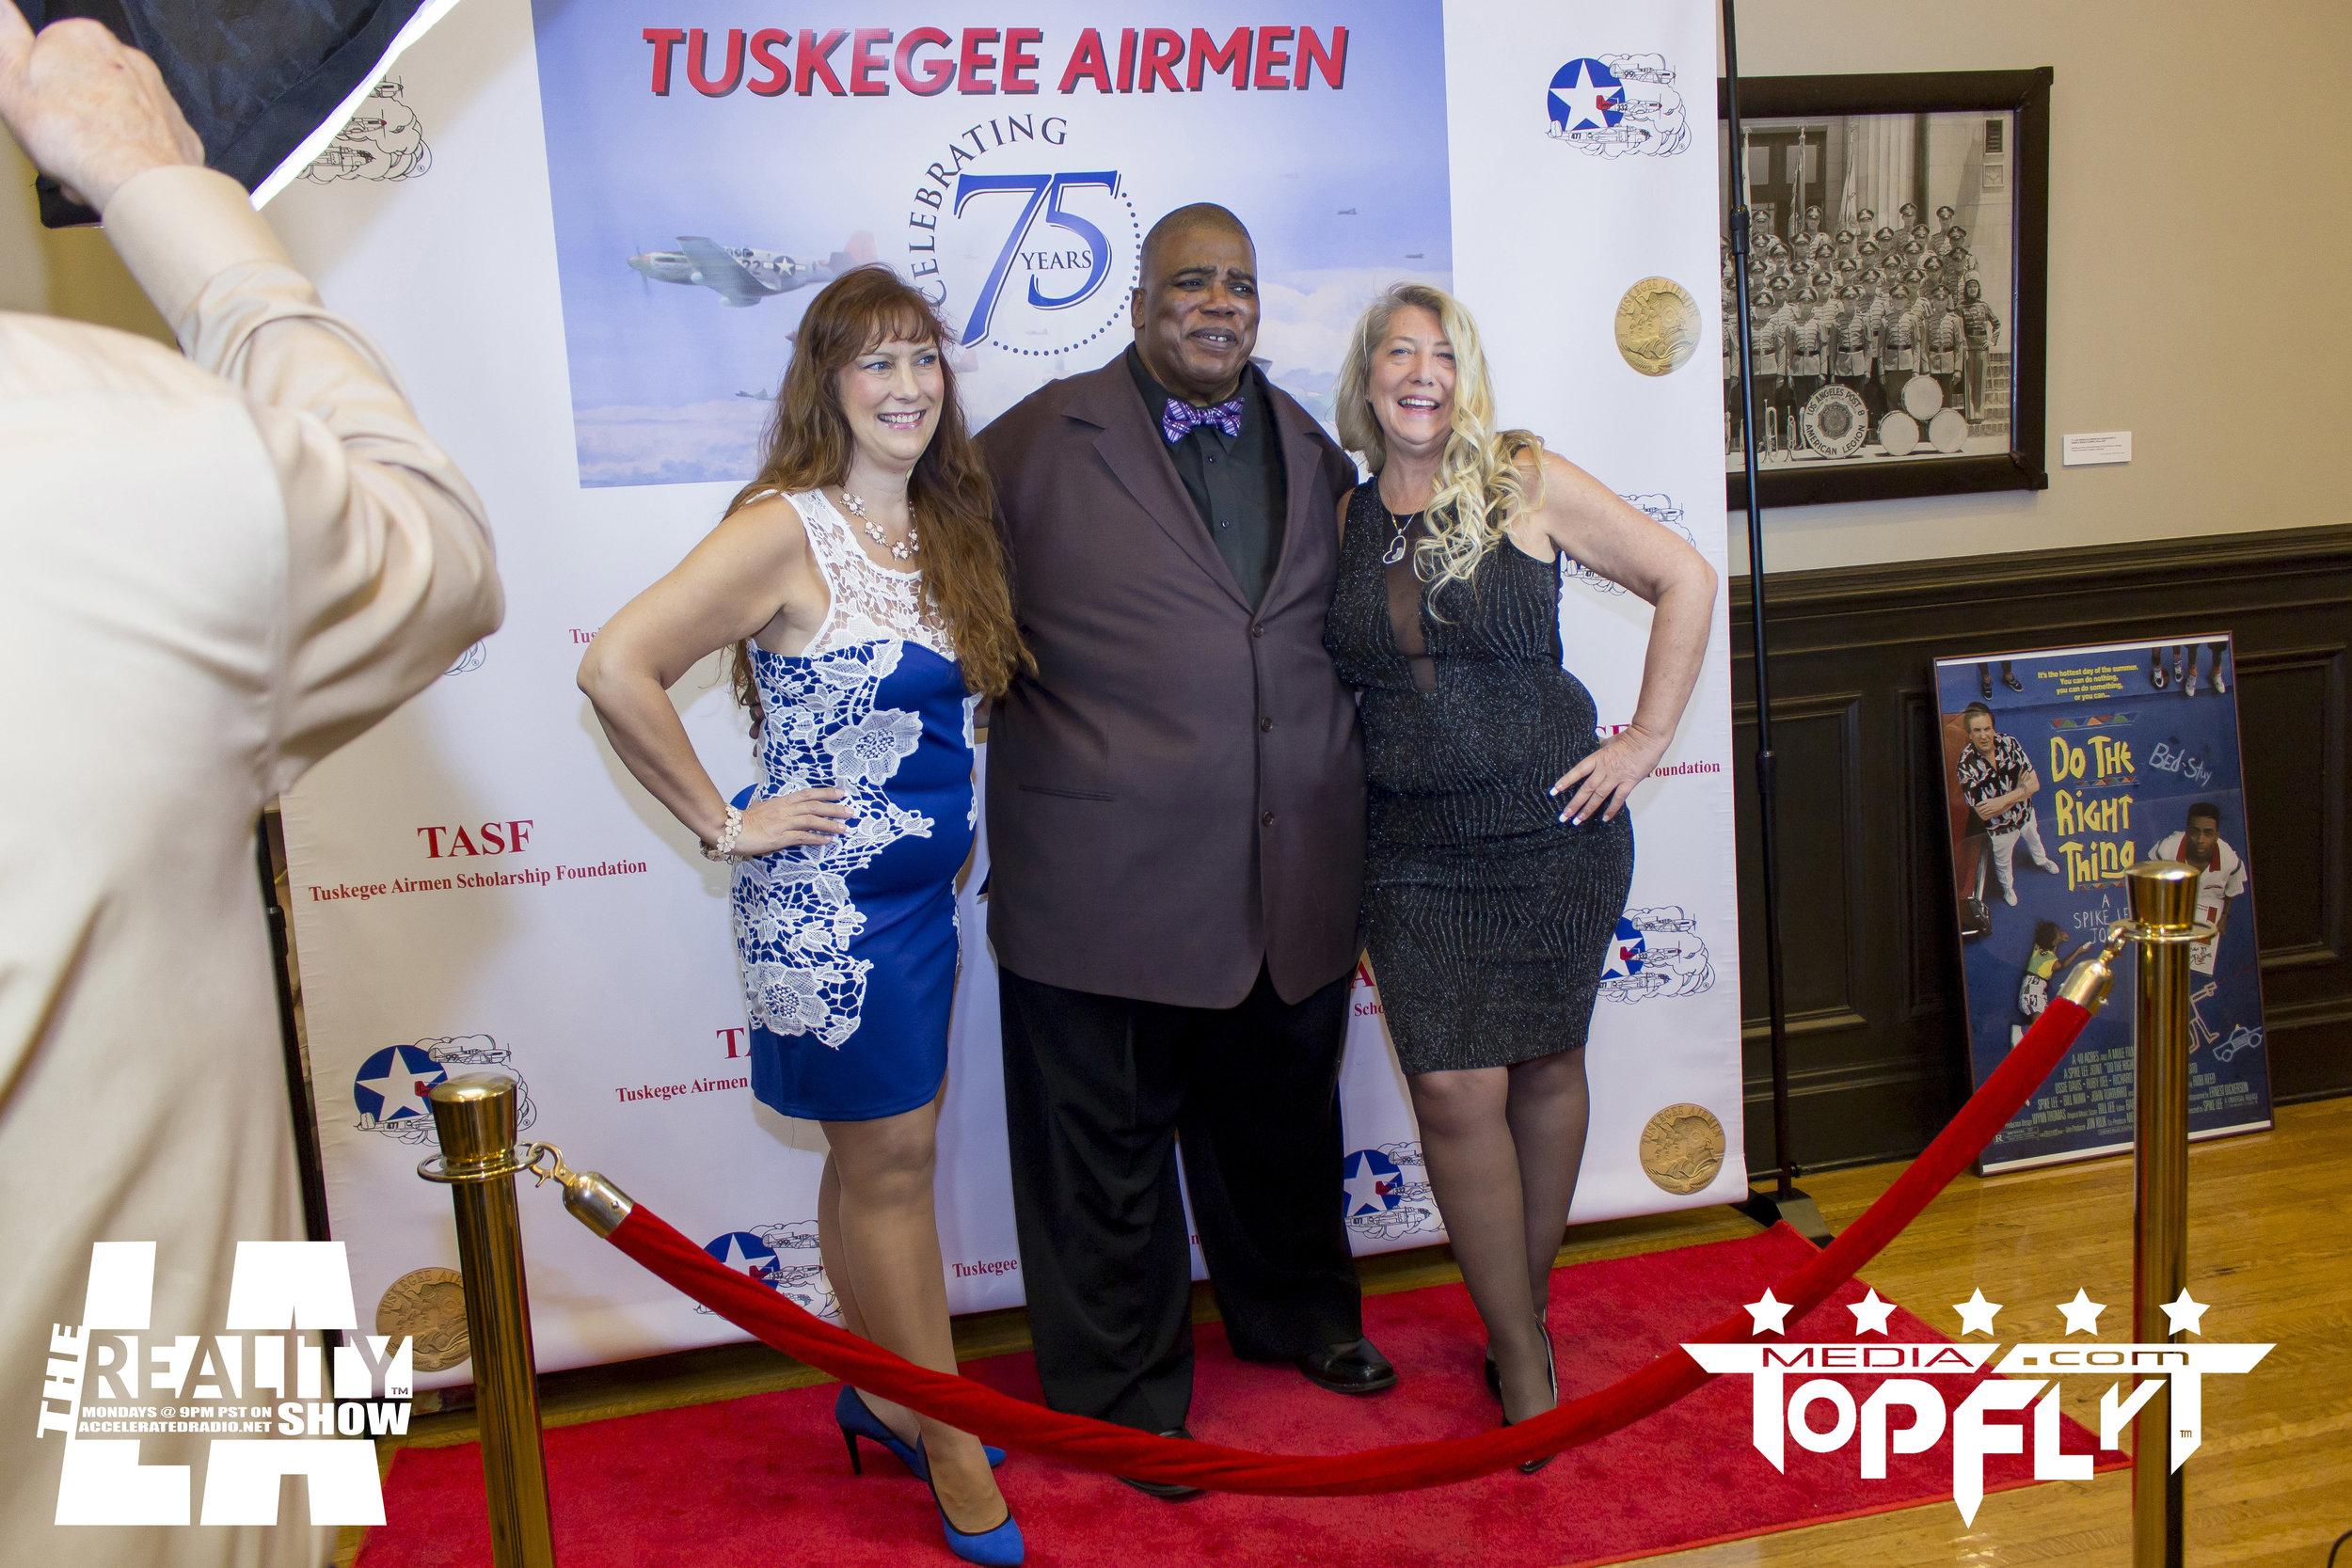 The Reality Show LA - Tuskegee Airmen 75th Anniversary VIP Reception_43.jpg